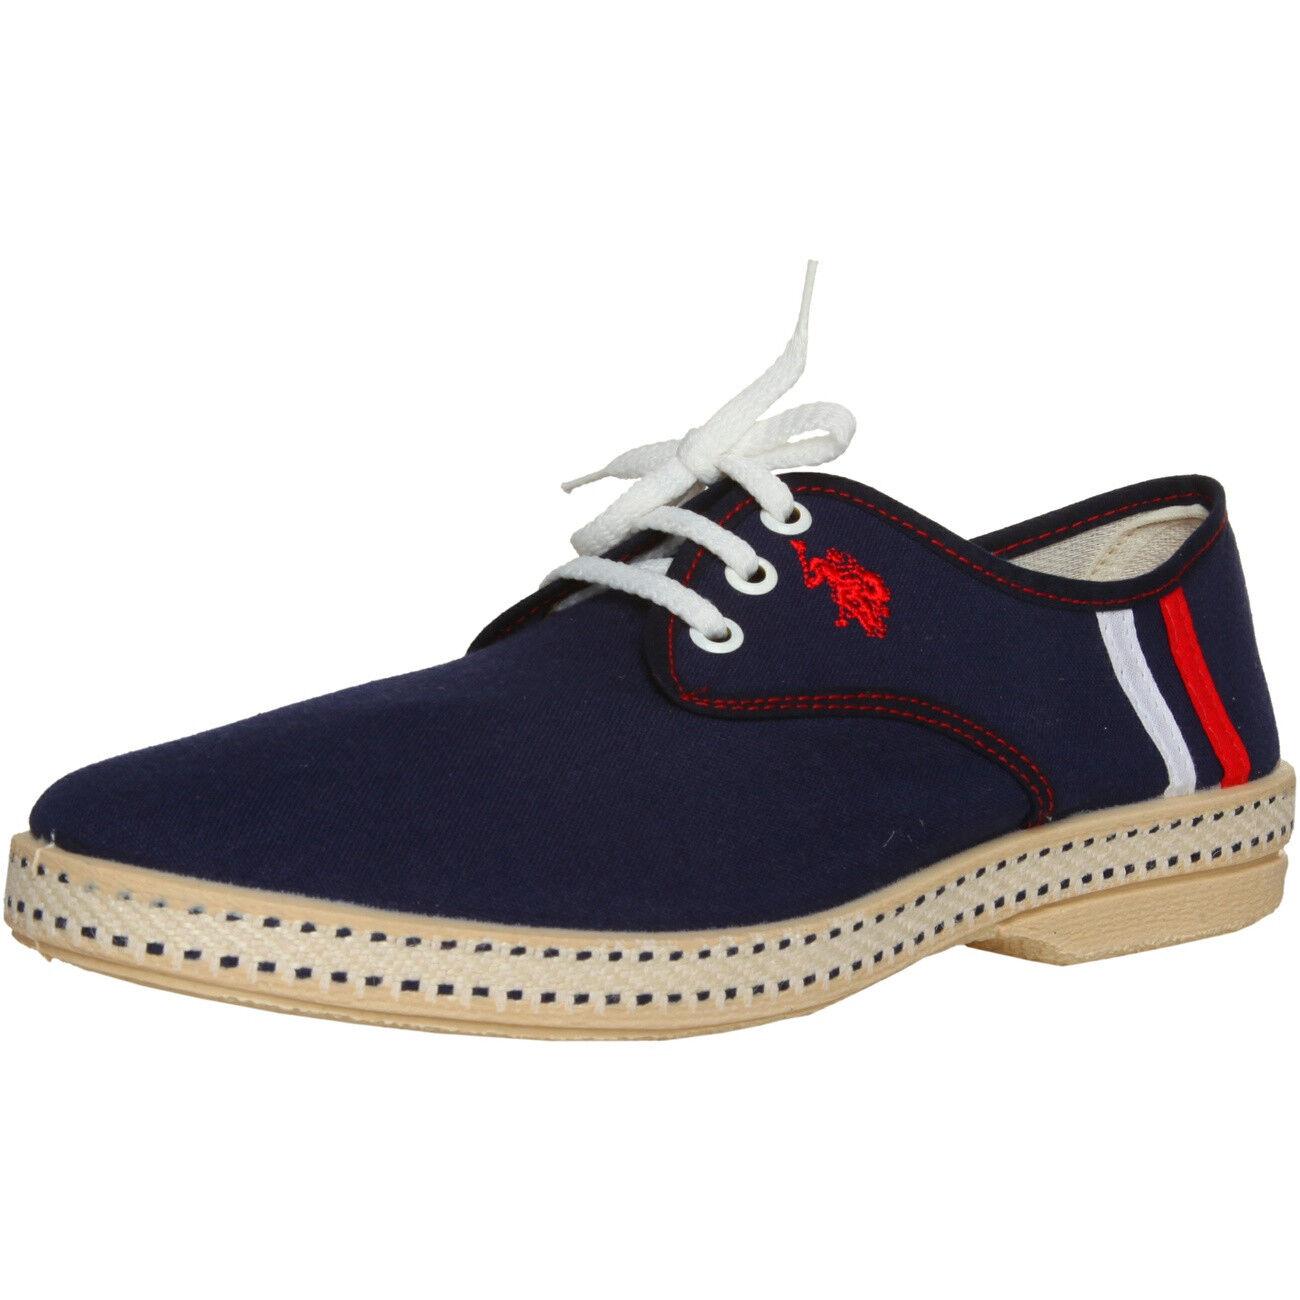 U.S. BLUE, Polo IBIZA Herren Slipper Sneakers Schuhe Halbschuhe BLUE, U.S. EU 41 42 45 264301